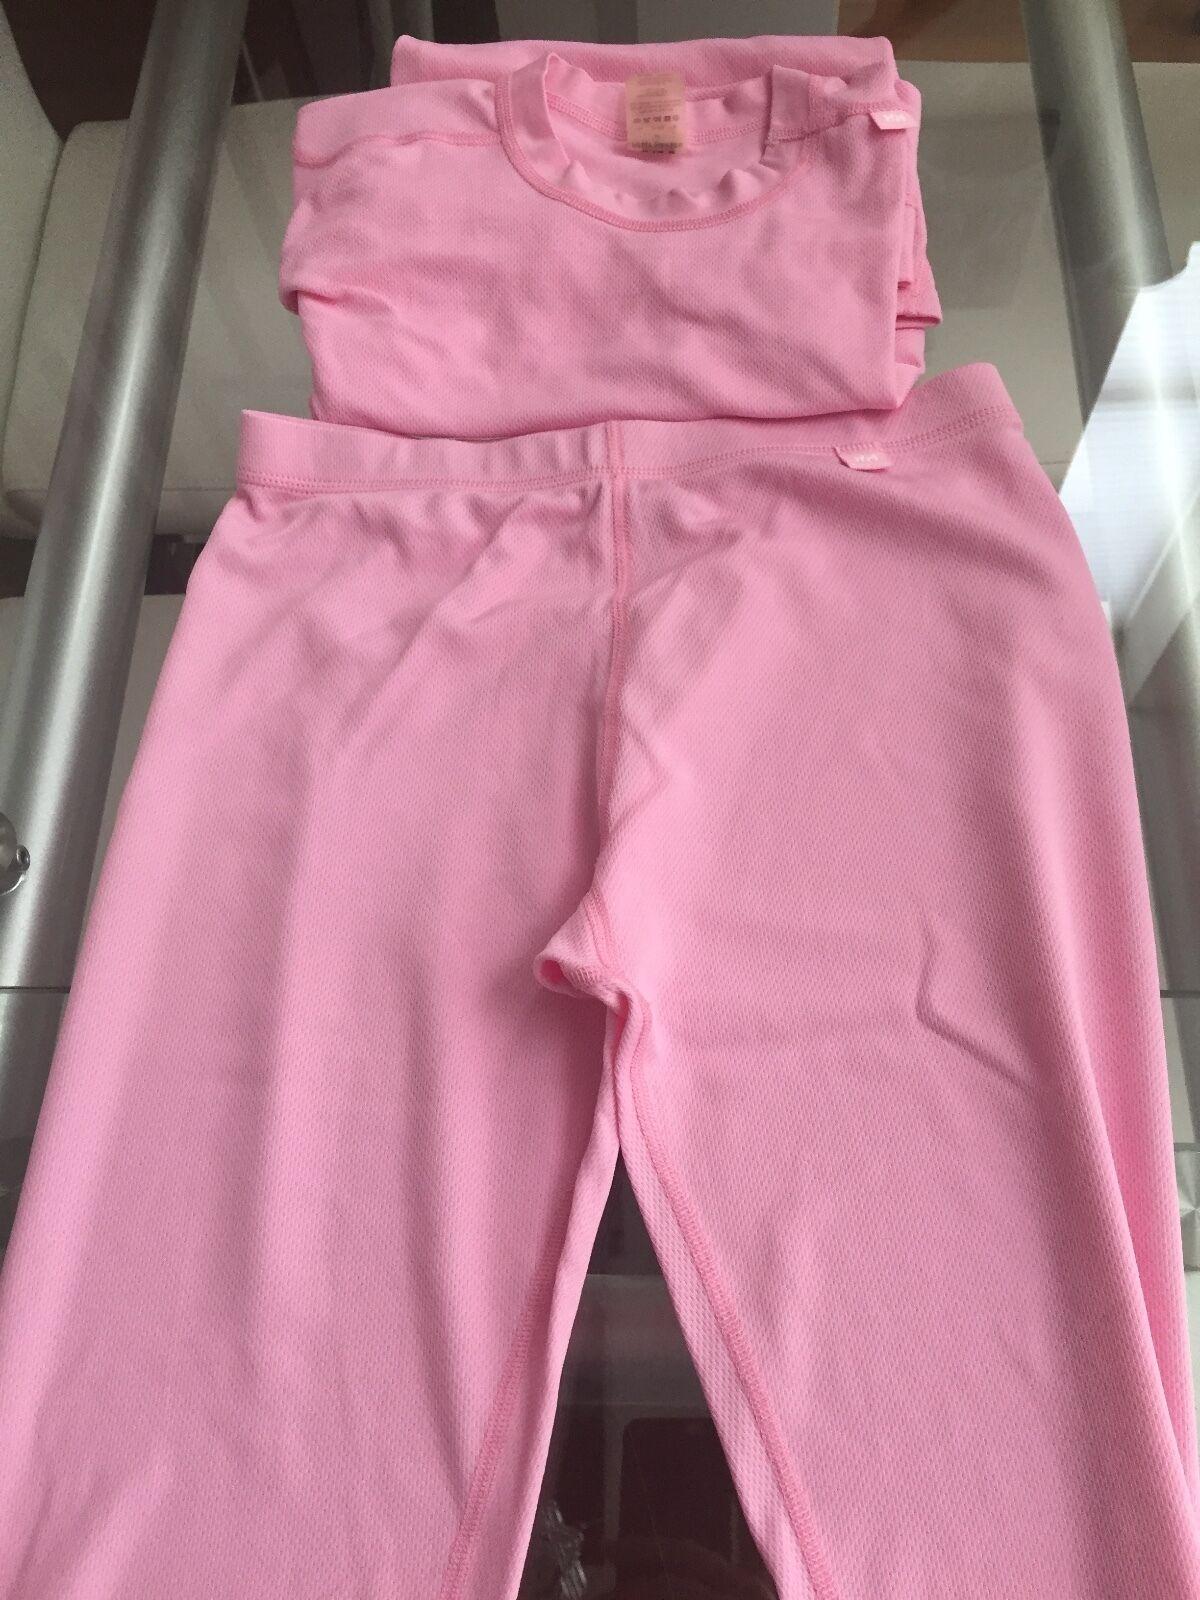 HELLY HANSEN Pink Dry Stripe Thermal Base Layer Ski Run Shirt & Leggings Sz M Re